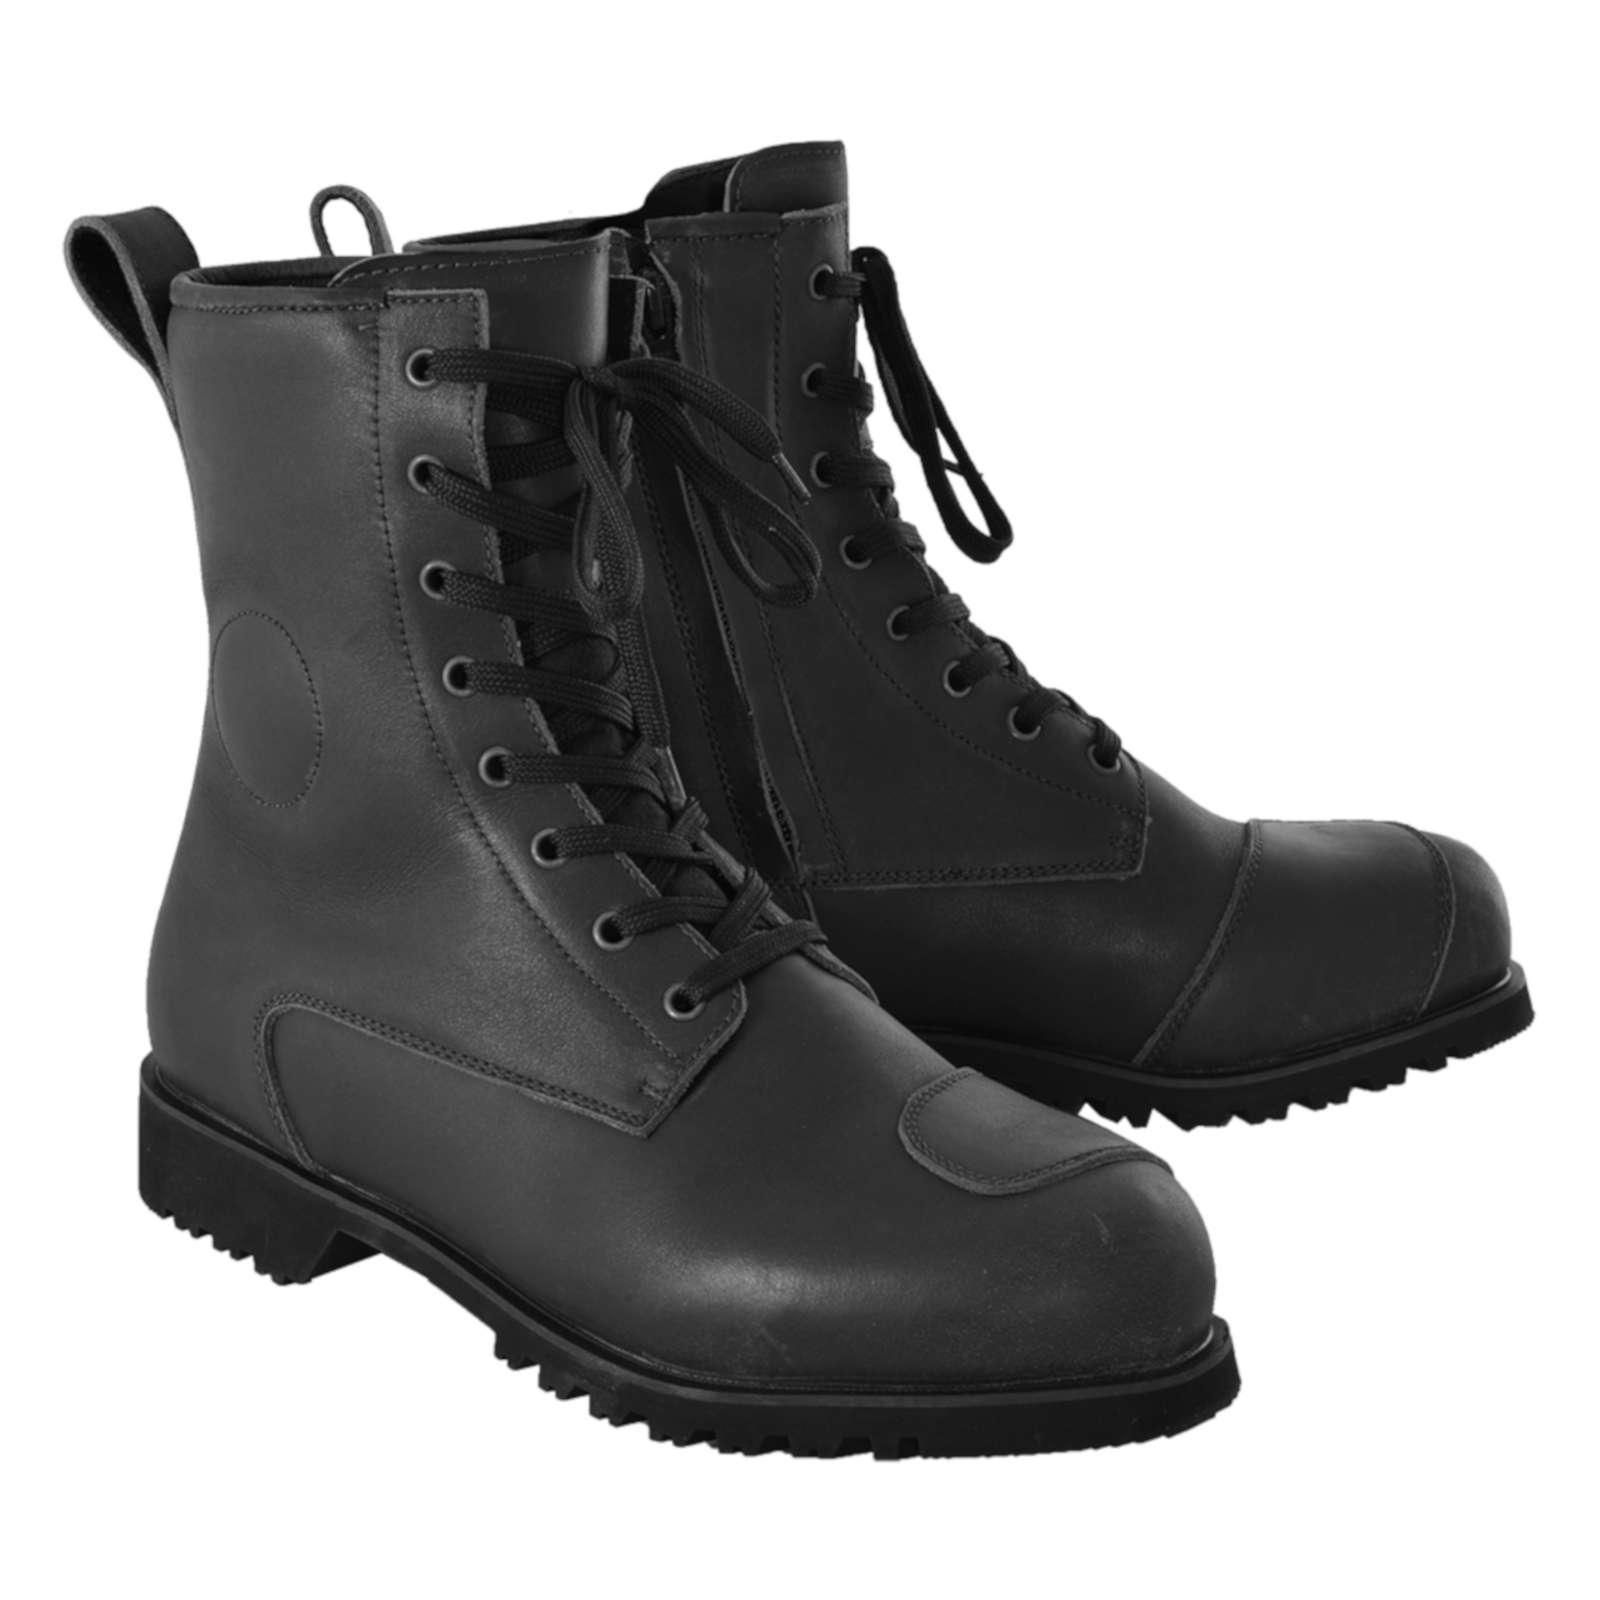 /Black/ /Black Oxford Cruiser Waterproof Leather Motorcycle Boots/ UK 18